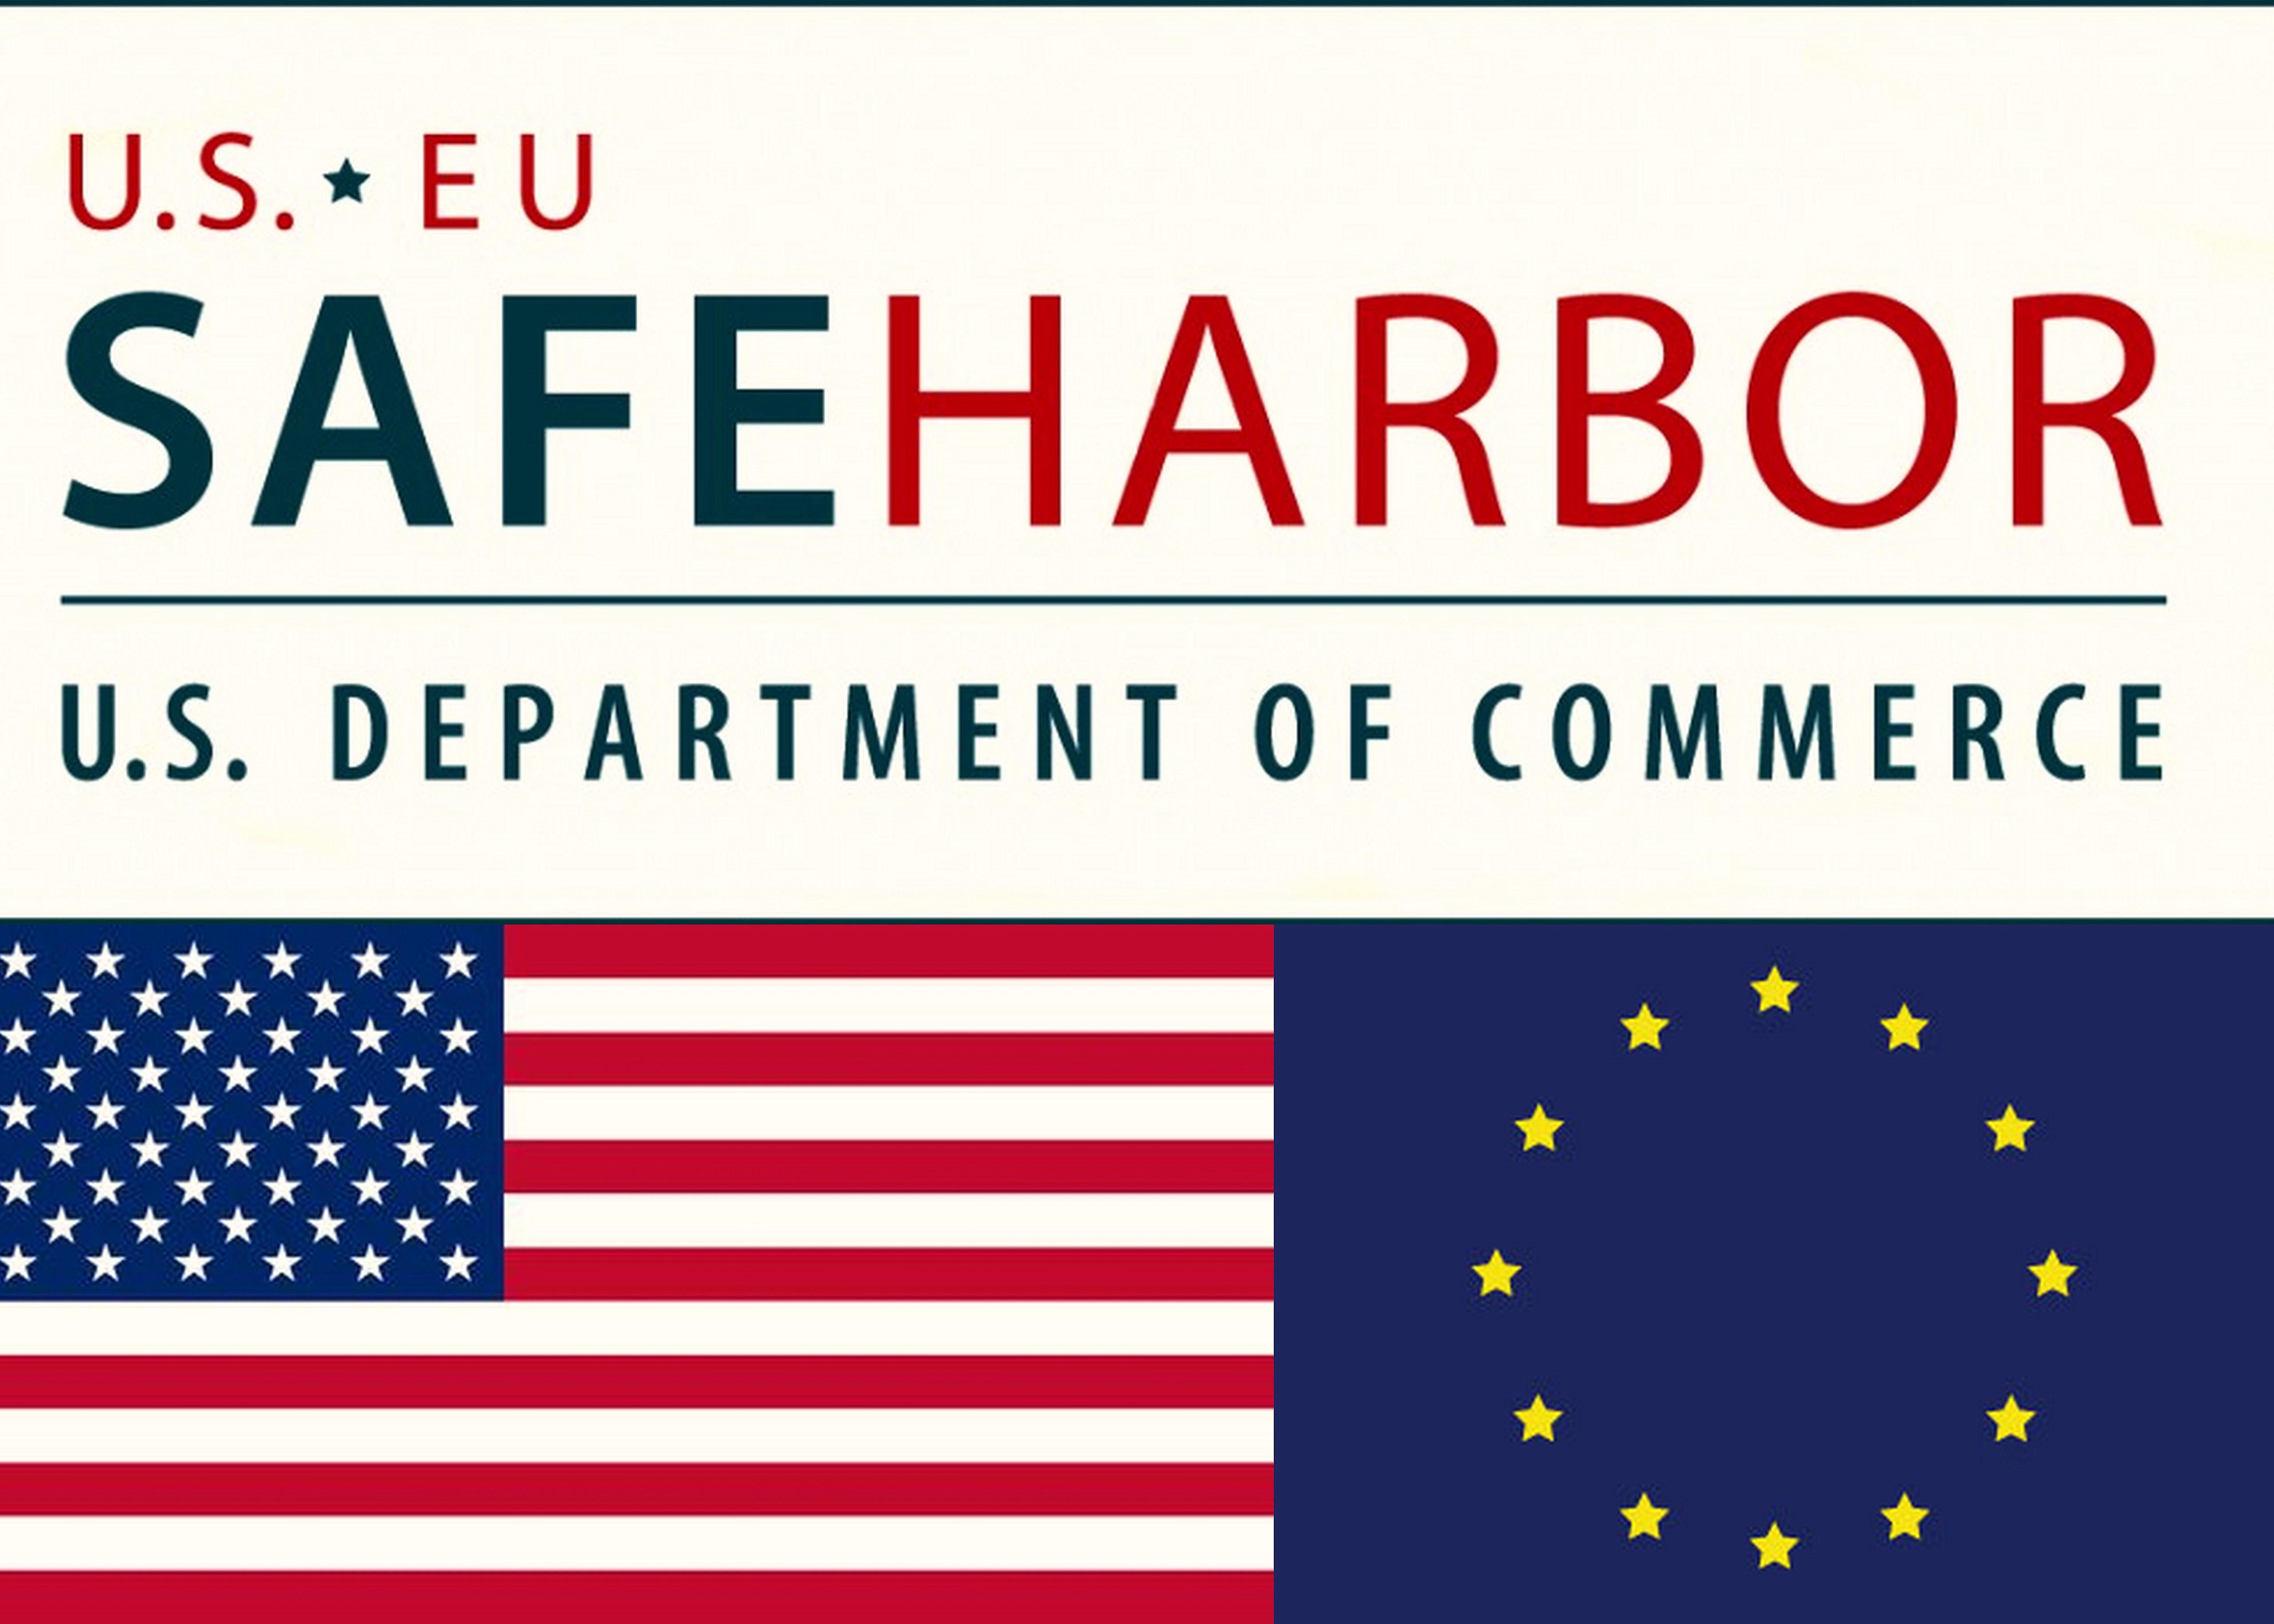 Ftc Continues Crackdown On Companies Making False Us Eu Safe Harbor